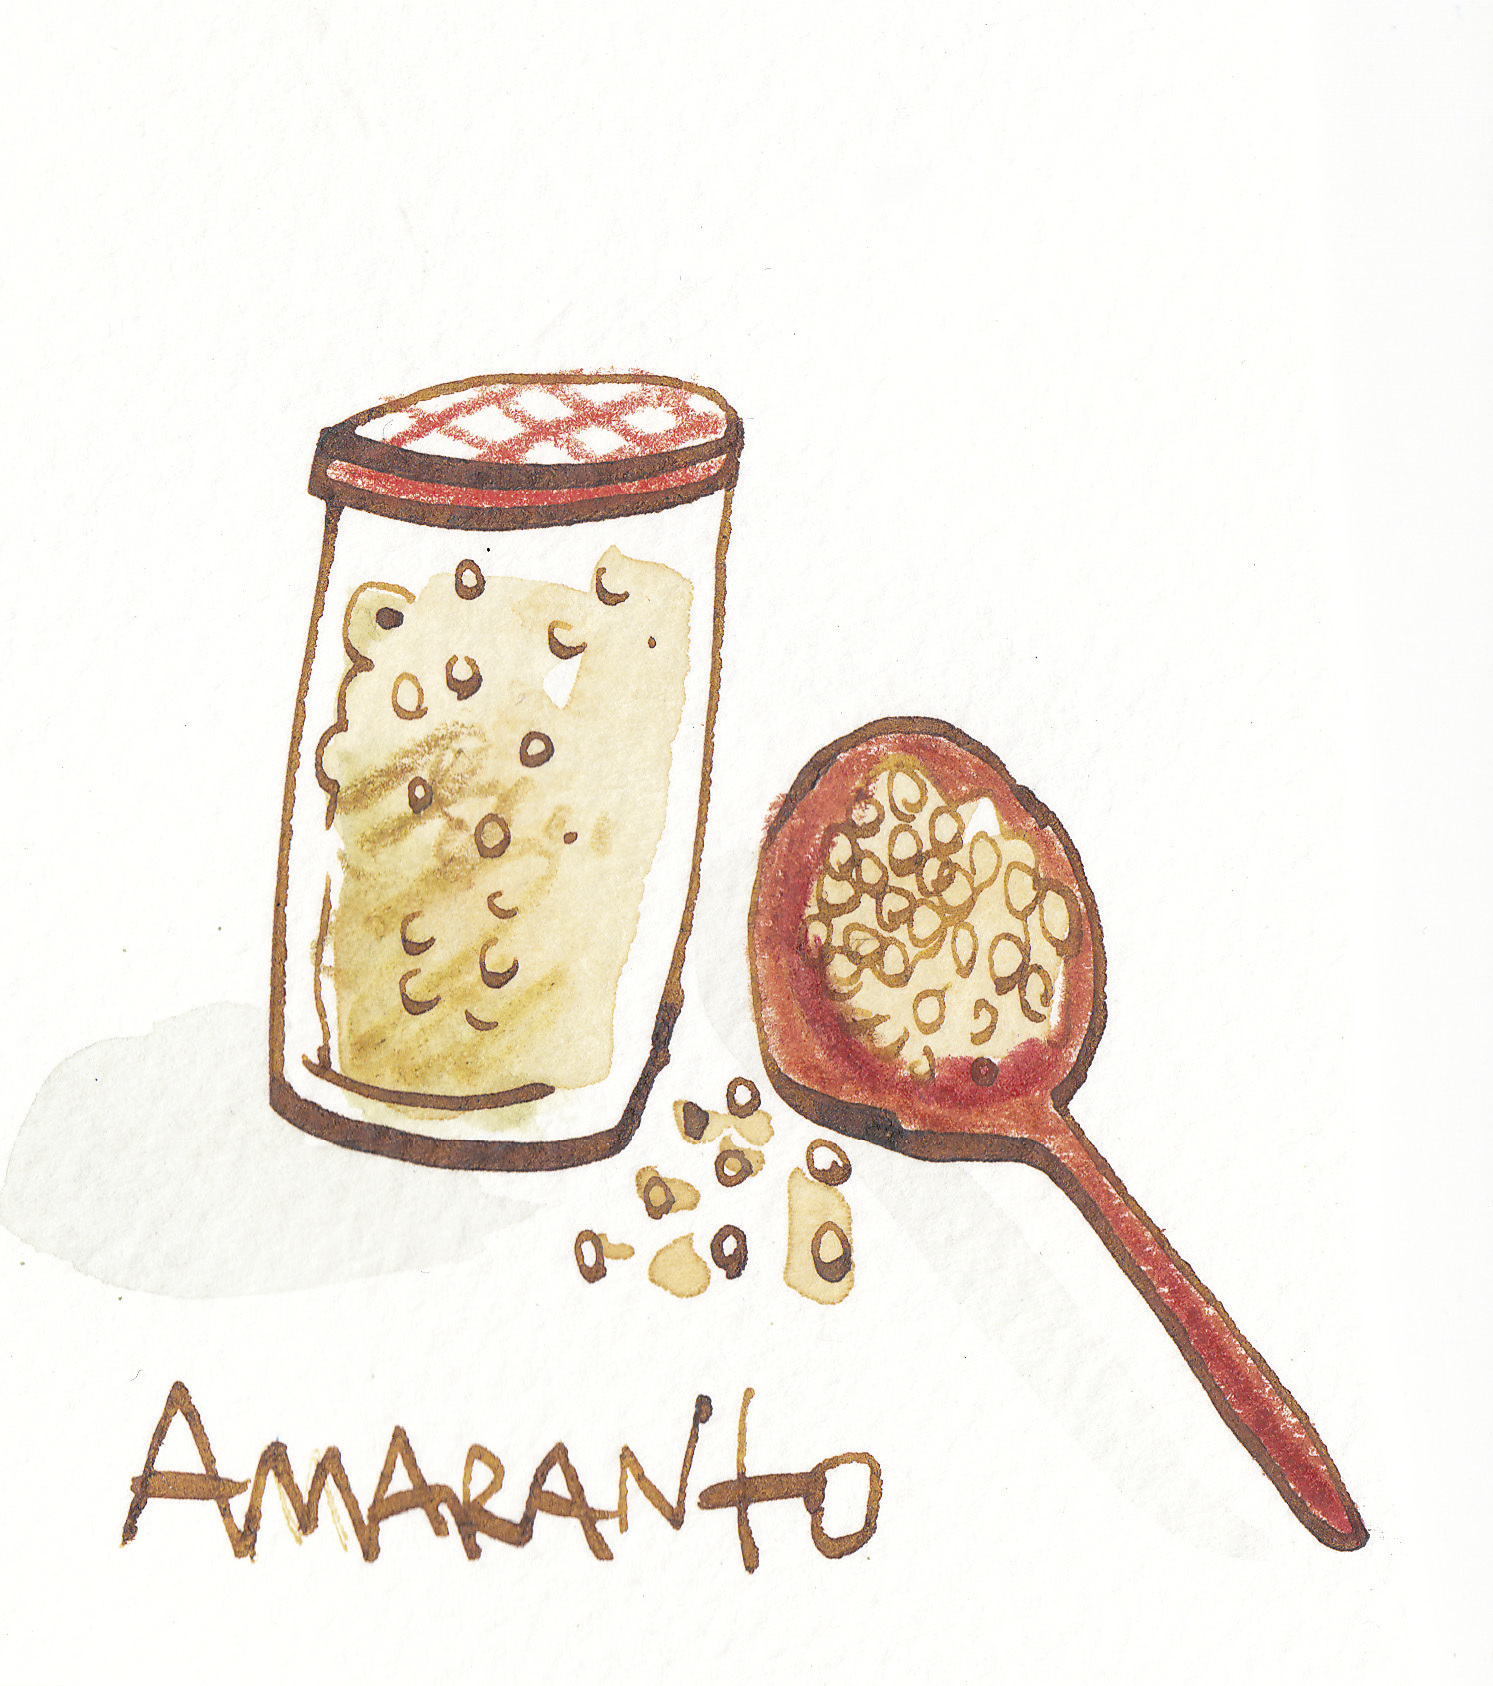 Amaranto.